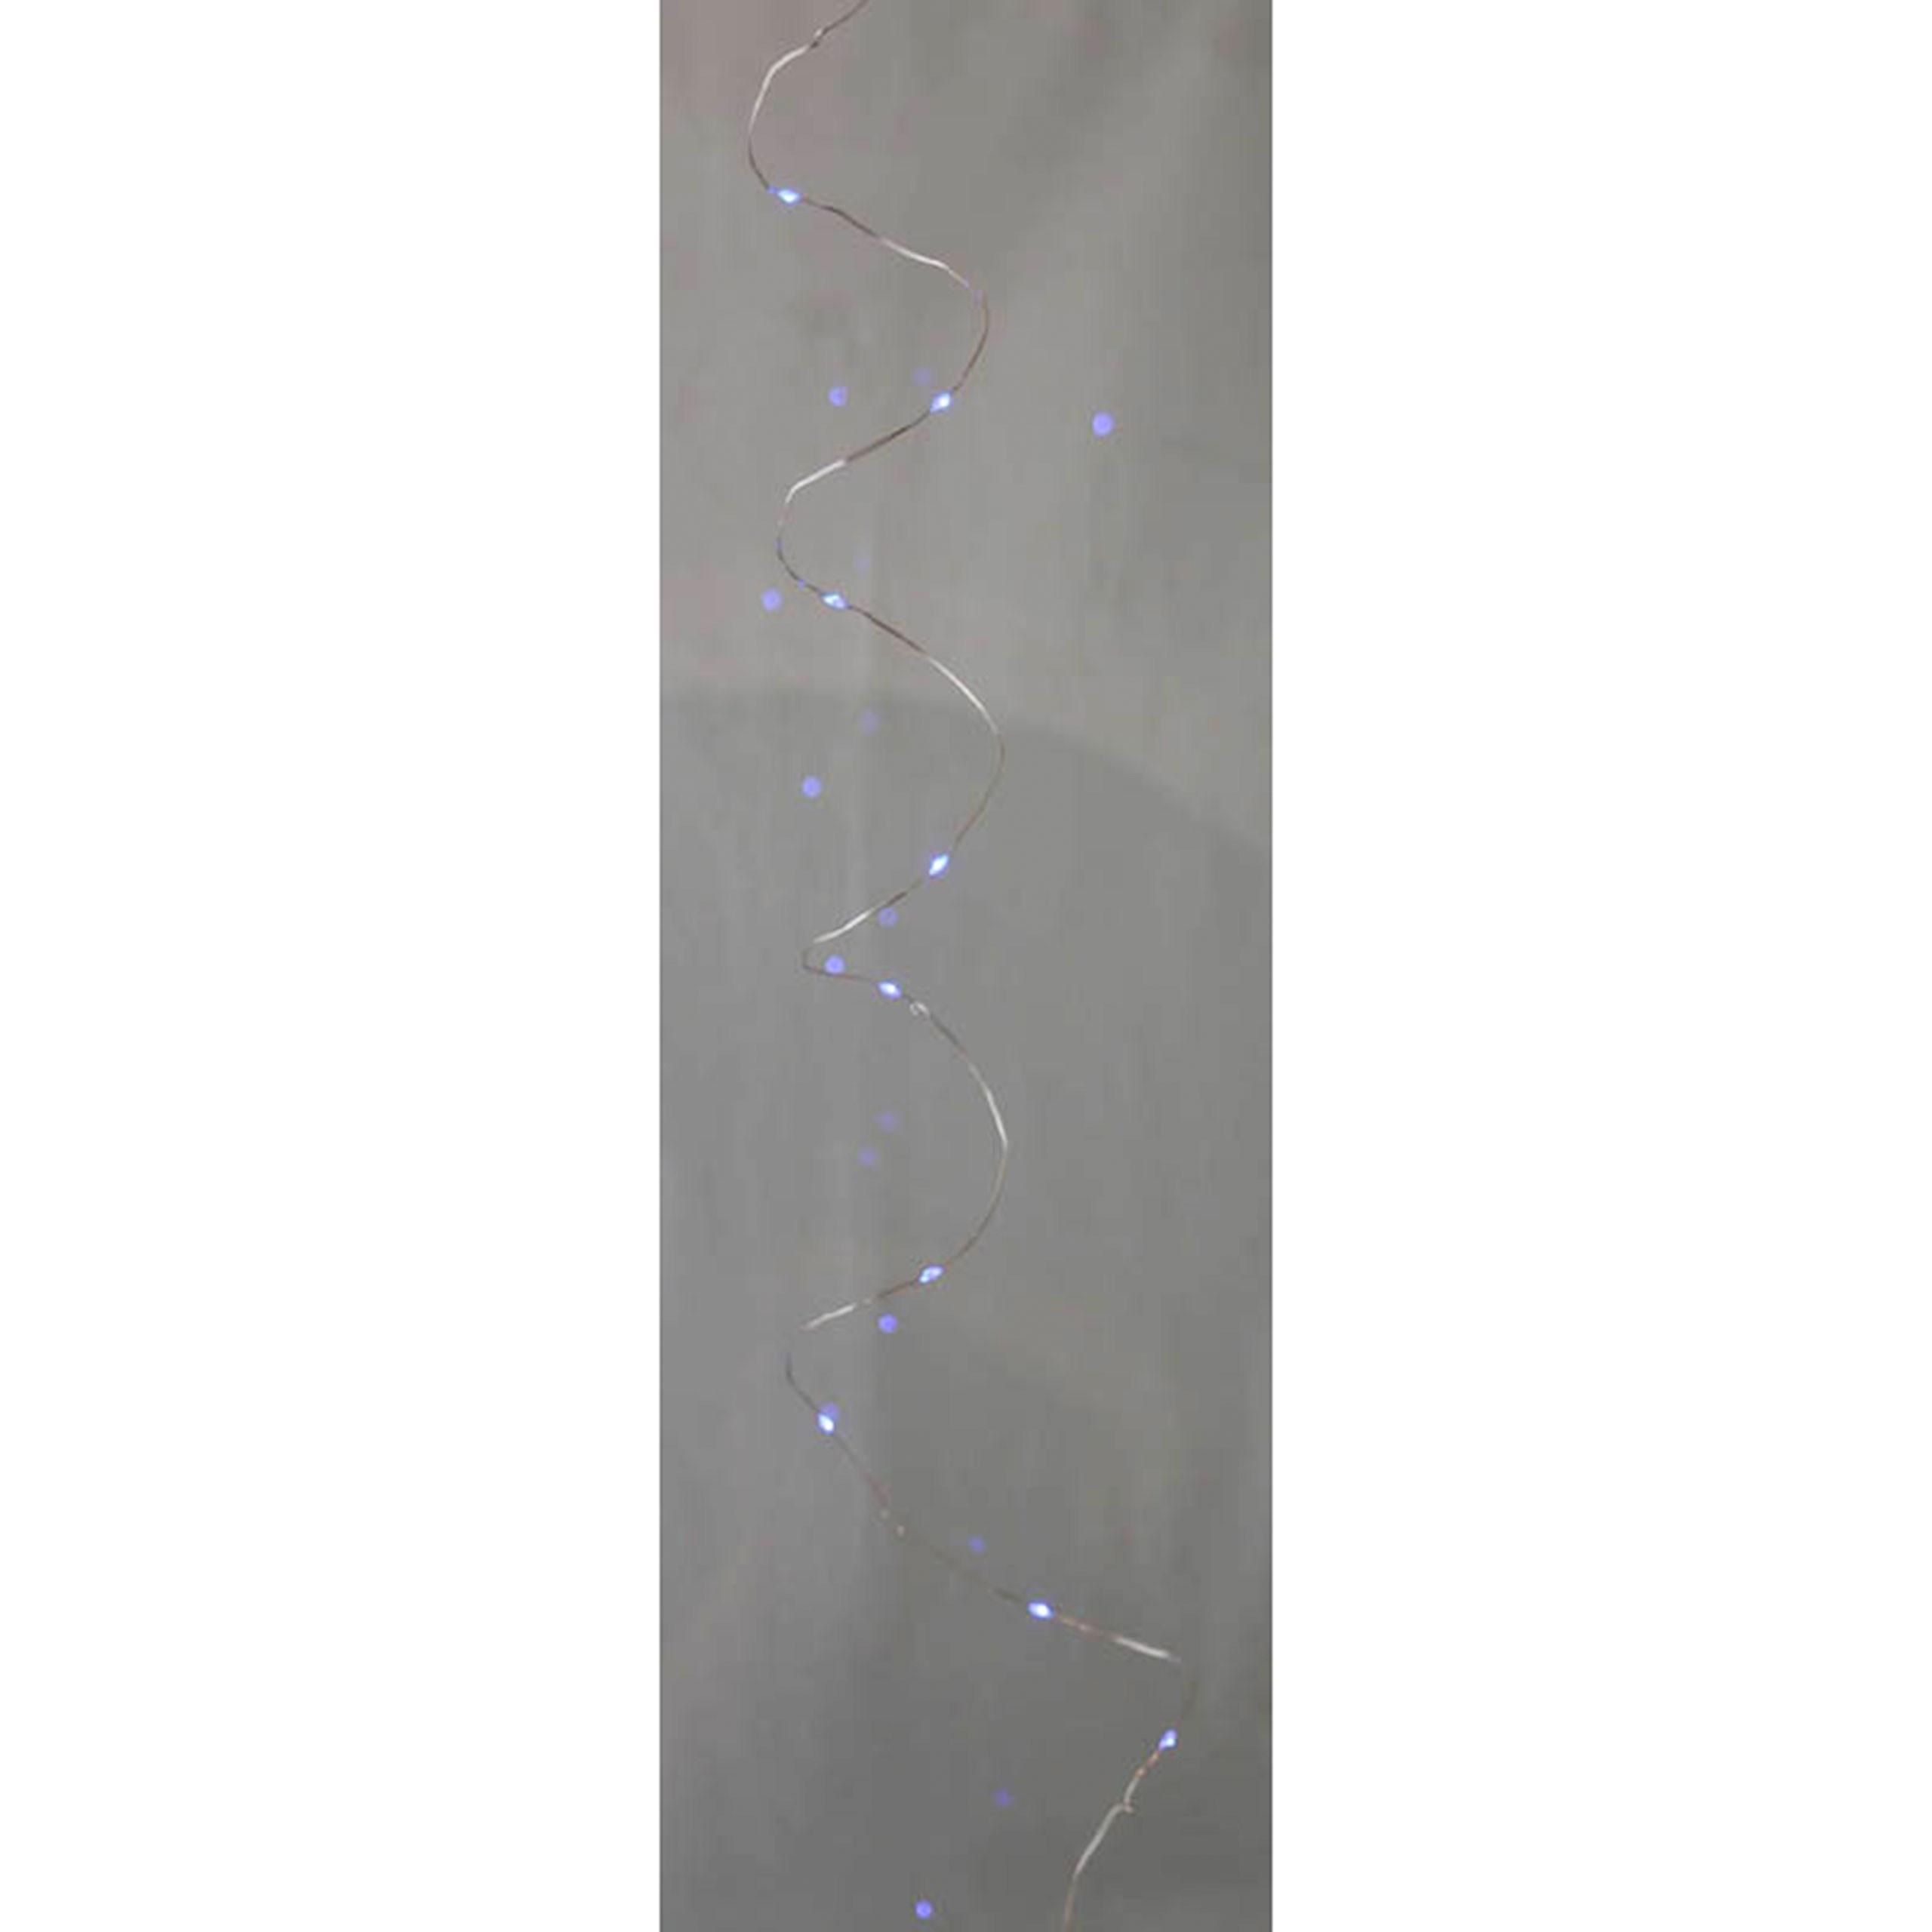 am design led silberdraht indoor lichterkette batterie betrieben 60 lichter blau. Black Bedroom Furniture Sets. Home Design Ideas